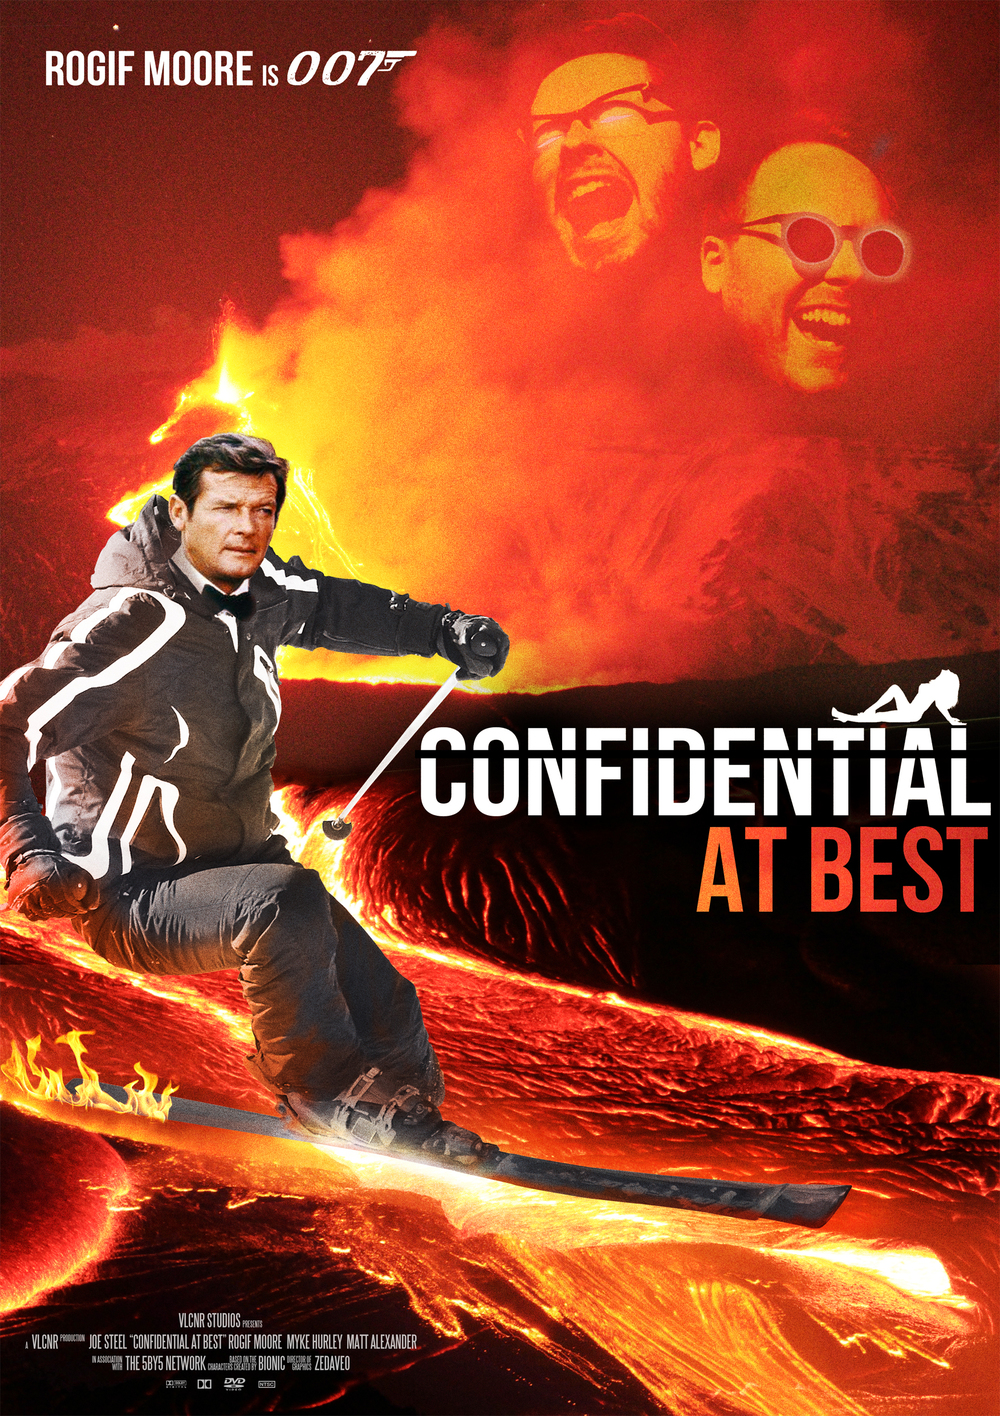 ConfidentialAtBest.jpg